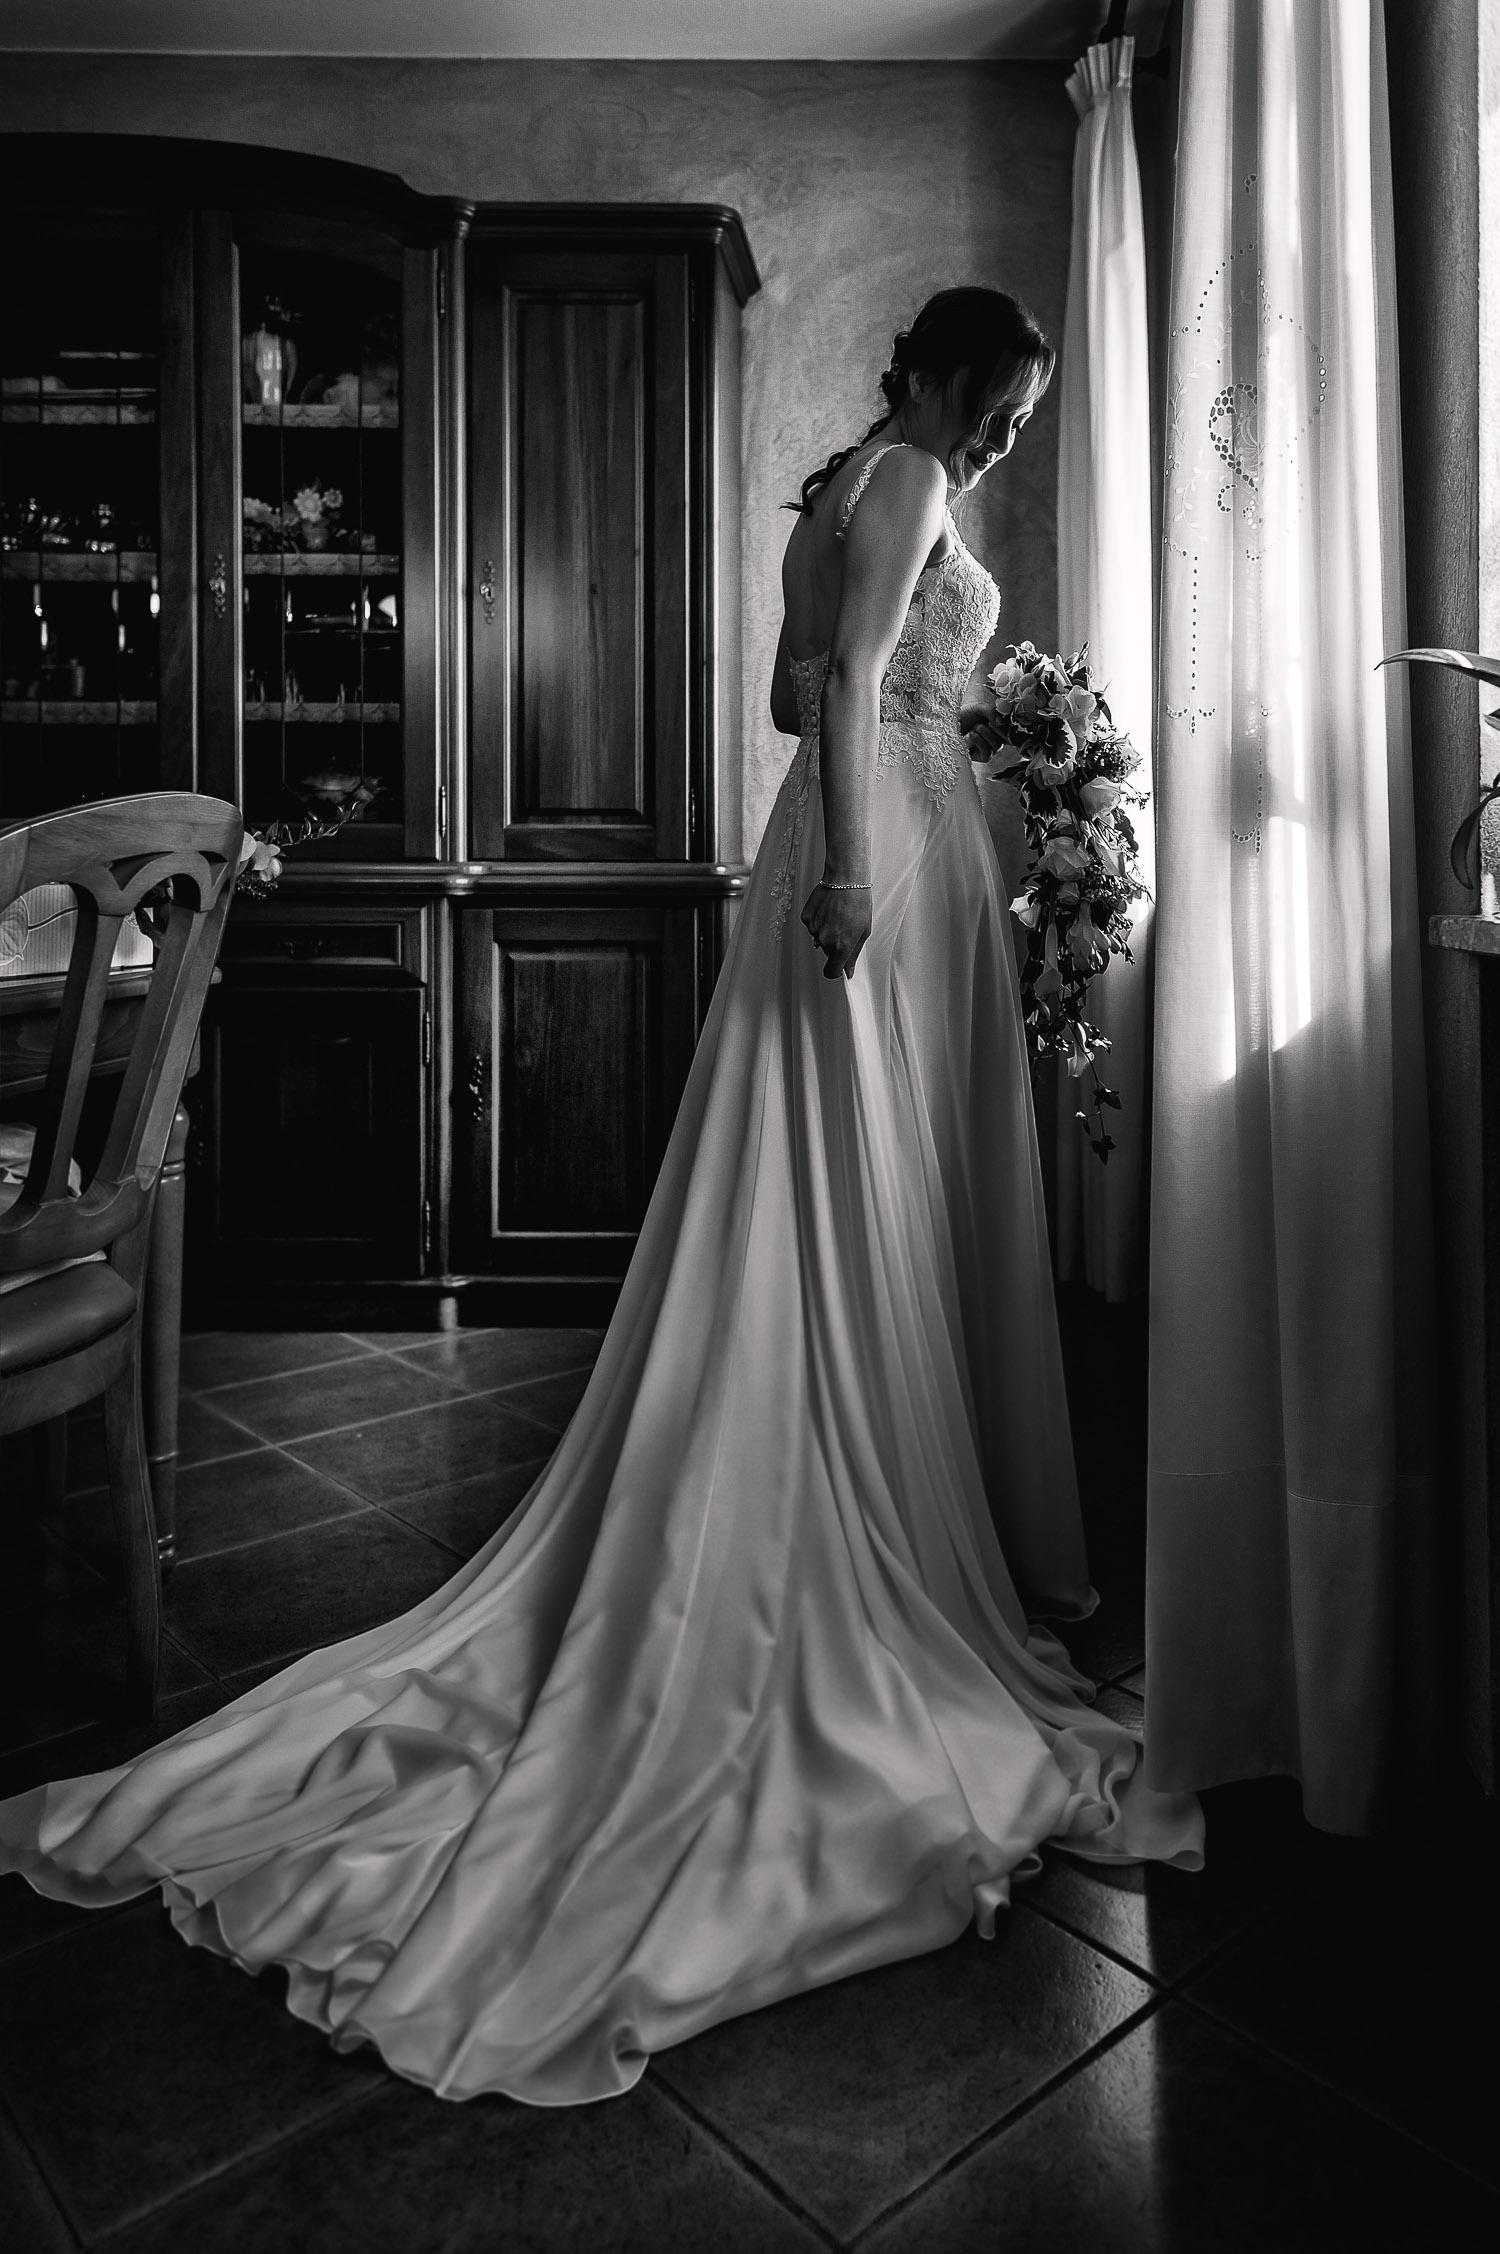 PAOLO-MANTOVAN-FOTOGRAFIA-ROMANTIC-WEDDING-IN-PIEMONTE-ADRIANA-E-LUCA-MAISON-VERTE-41